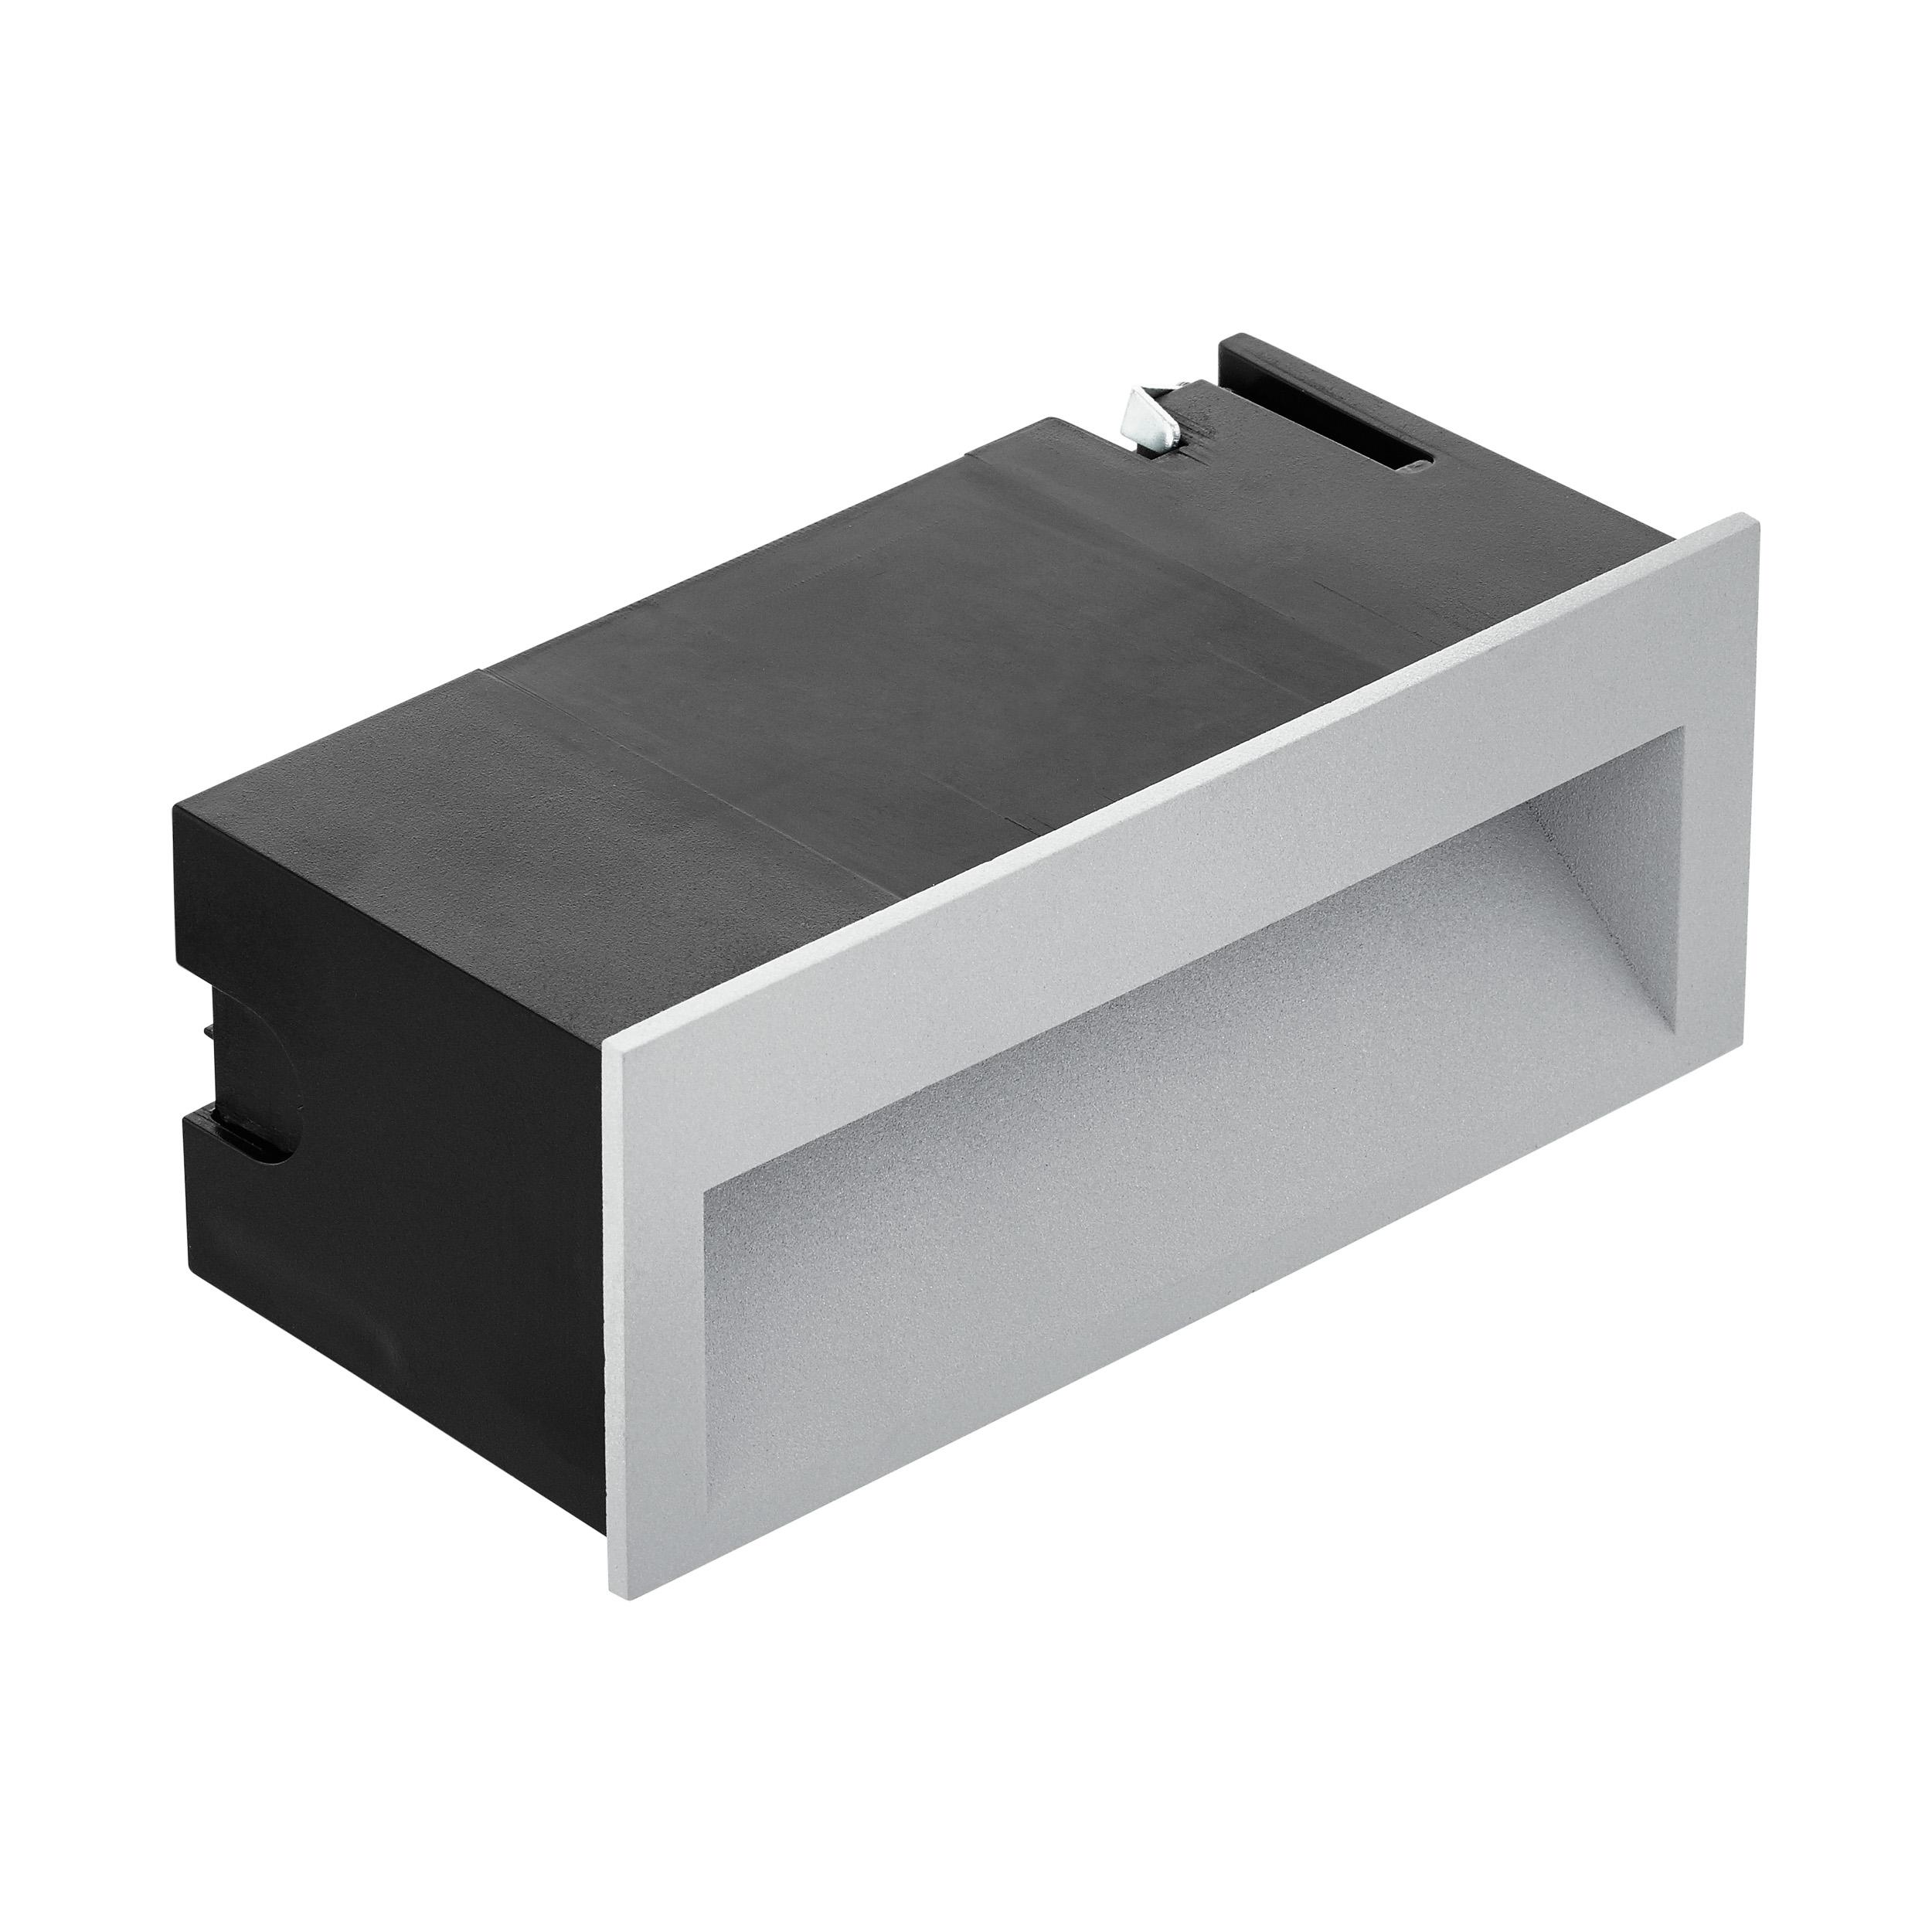 1 Stk Zimba Pro 4W 3000K silbergrau IP65 LI66268---